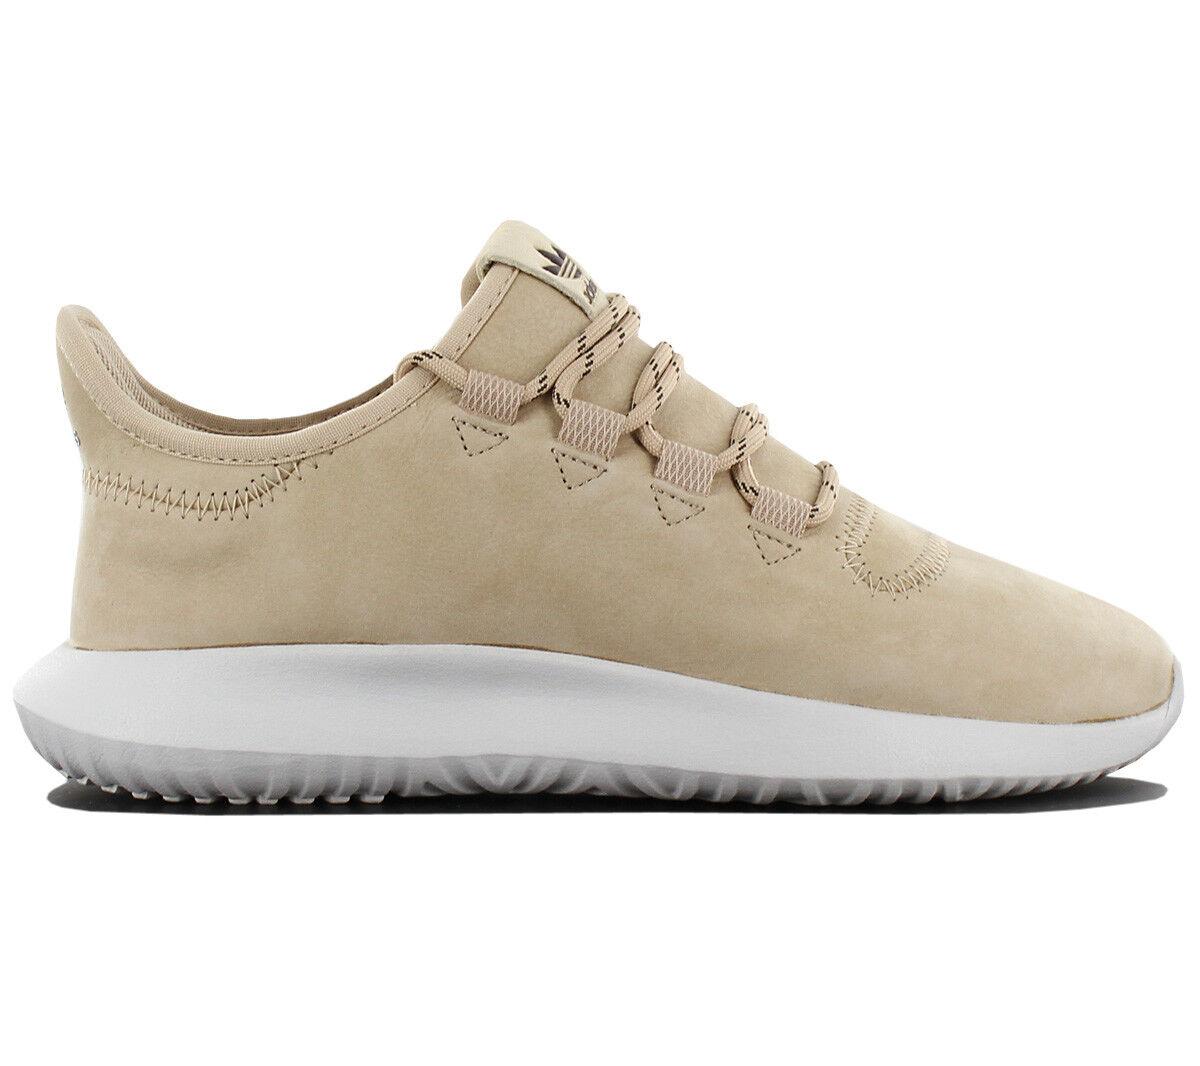 Adidas Originals Tubular Shadow Leather Ladies Sneaker shoes Beige Bb6231